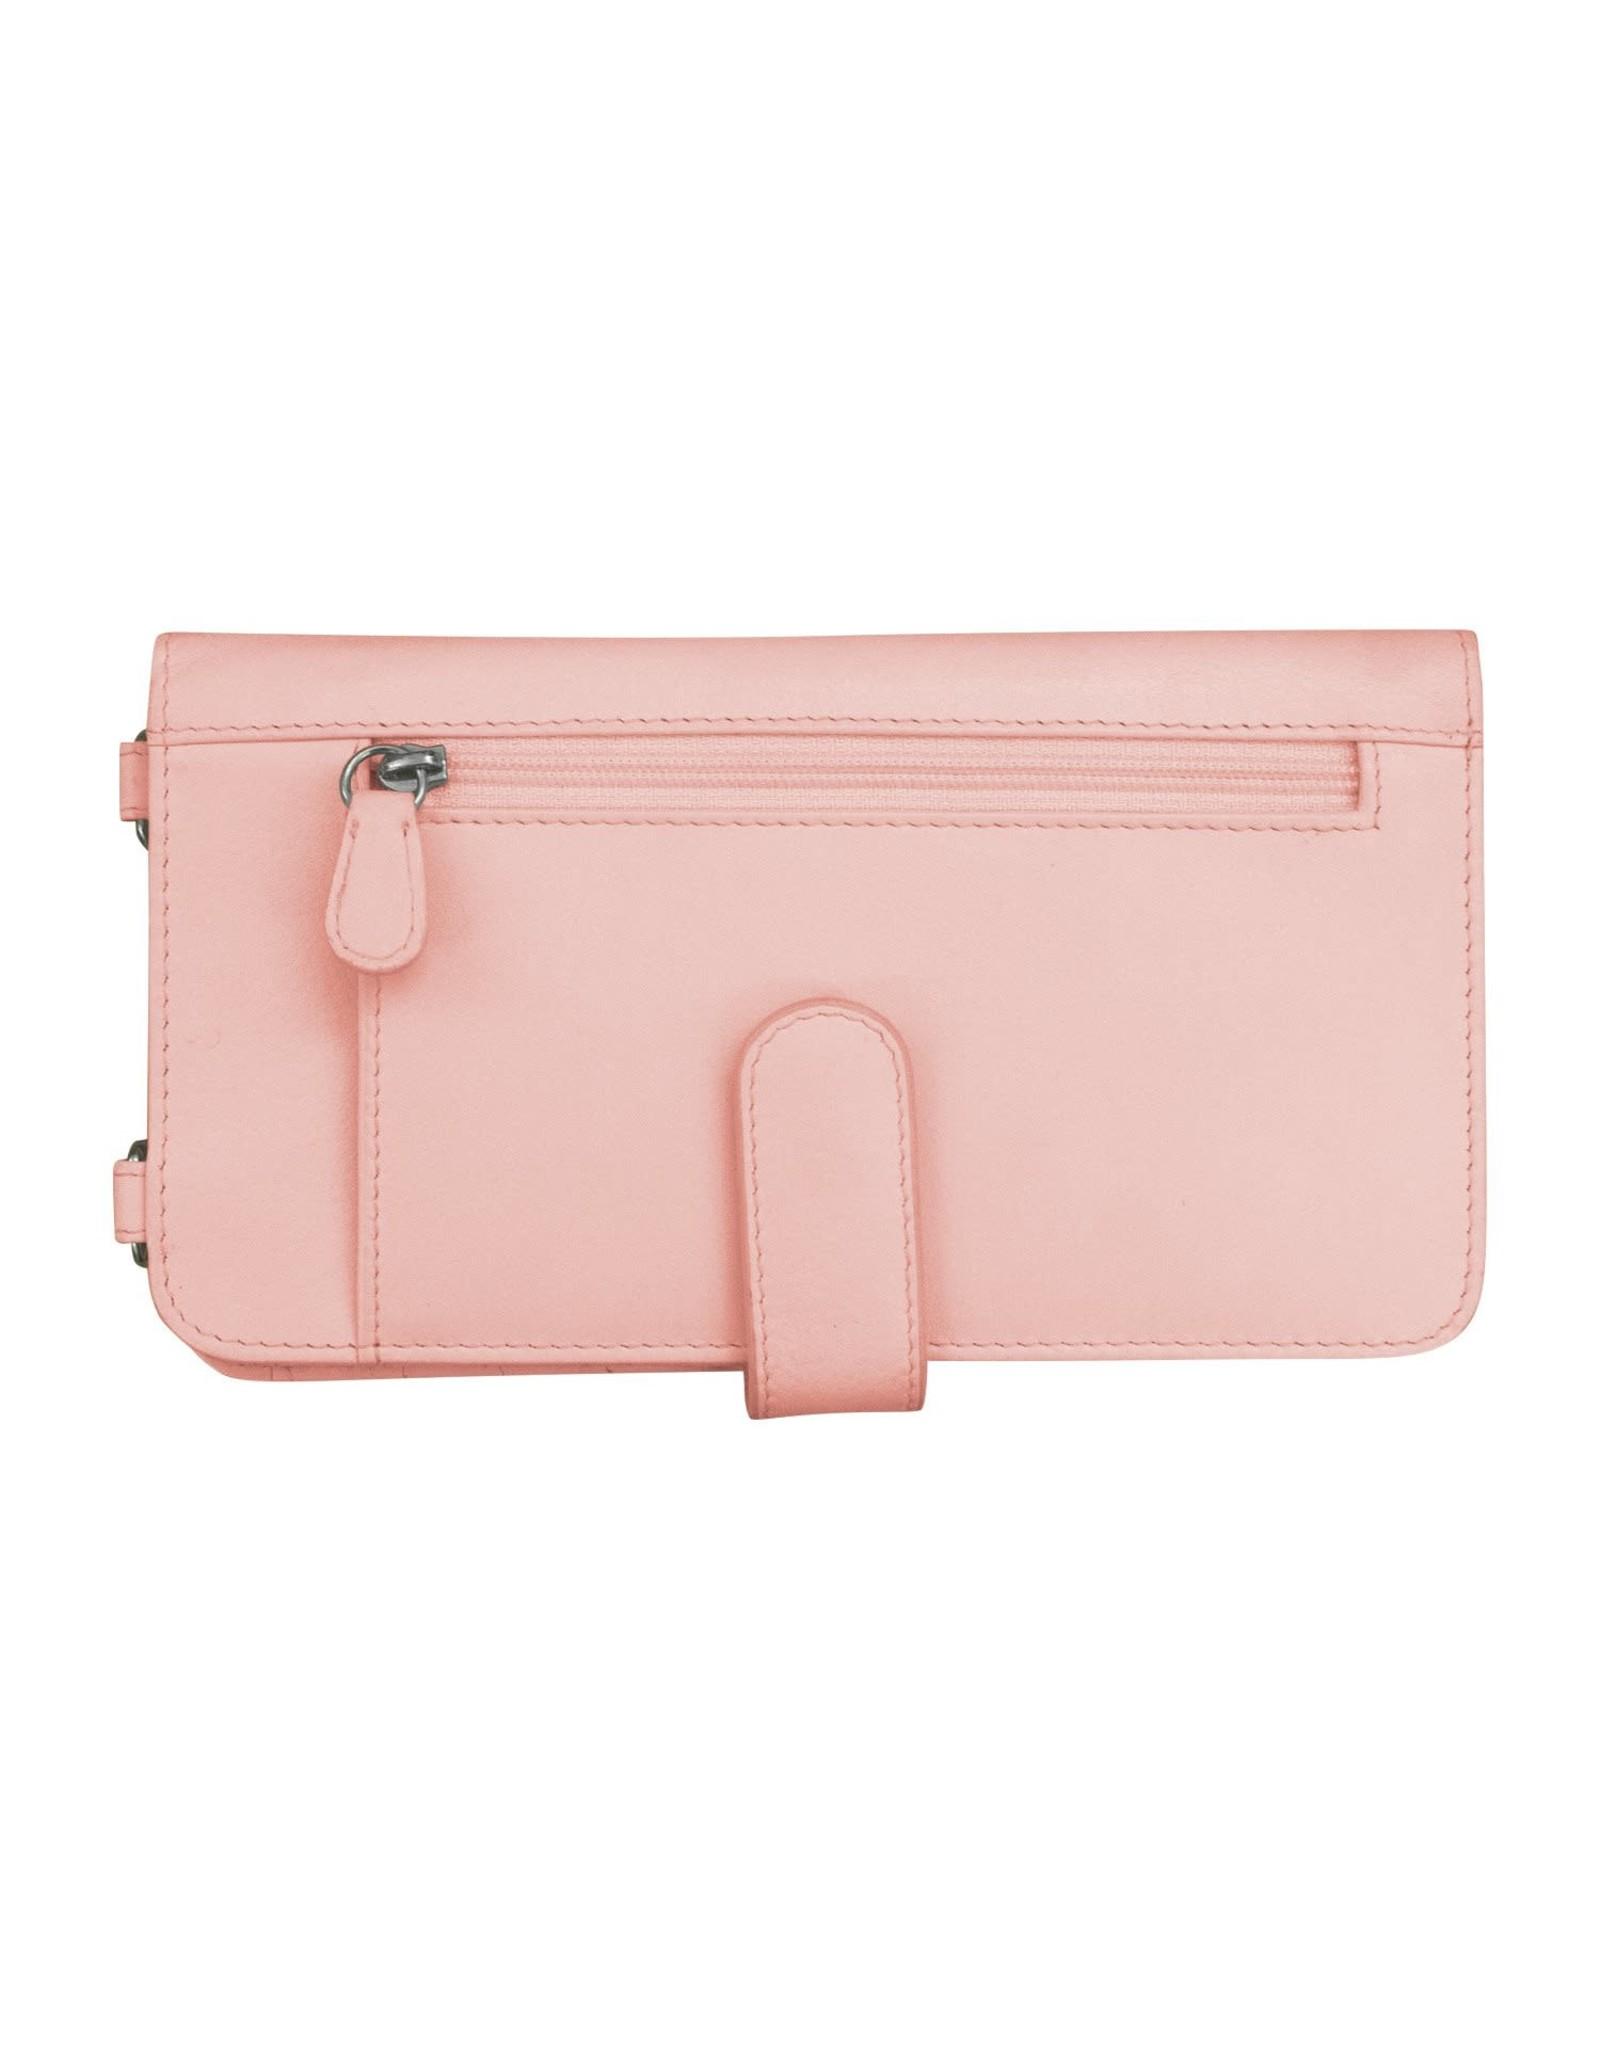 Leather Handbags and Accessories 6363 Pastel Pink - RFID Organizer Crossbody